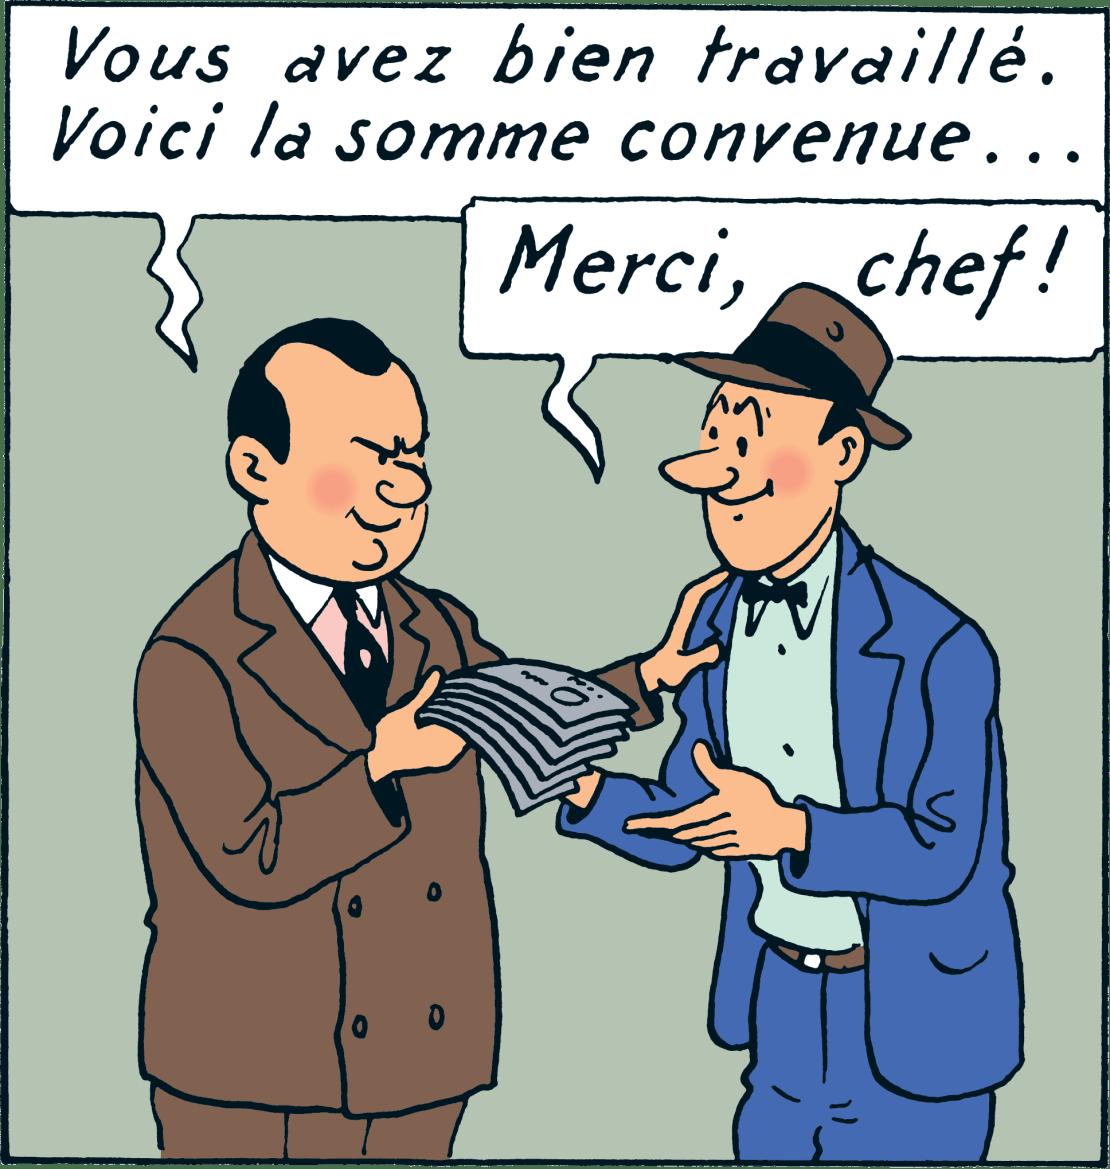 Tintin - Les Aventures de Tintin - Tintin en Amérique - Personnage Al Capone